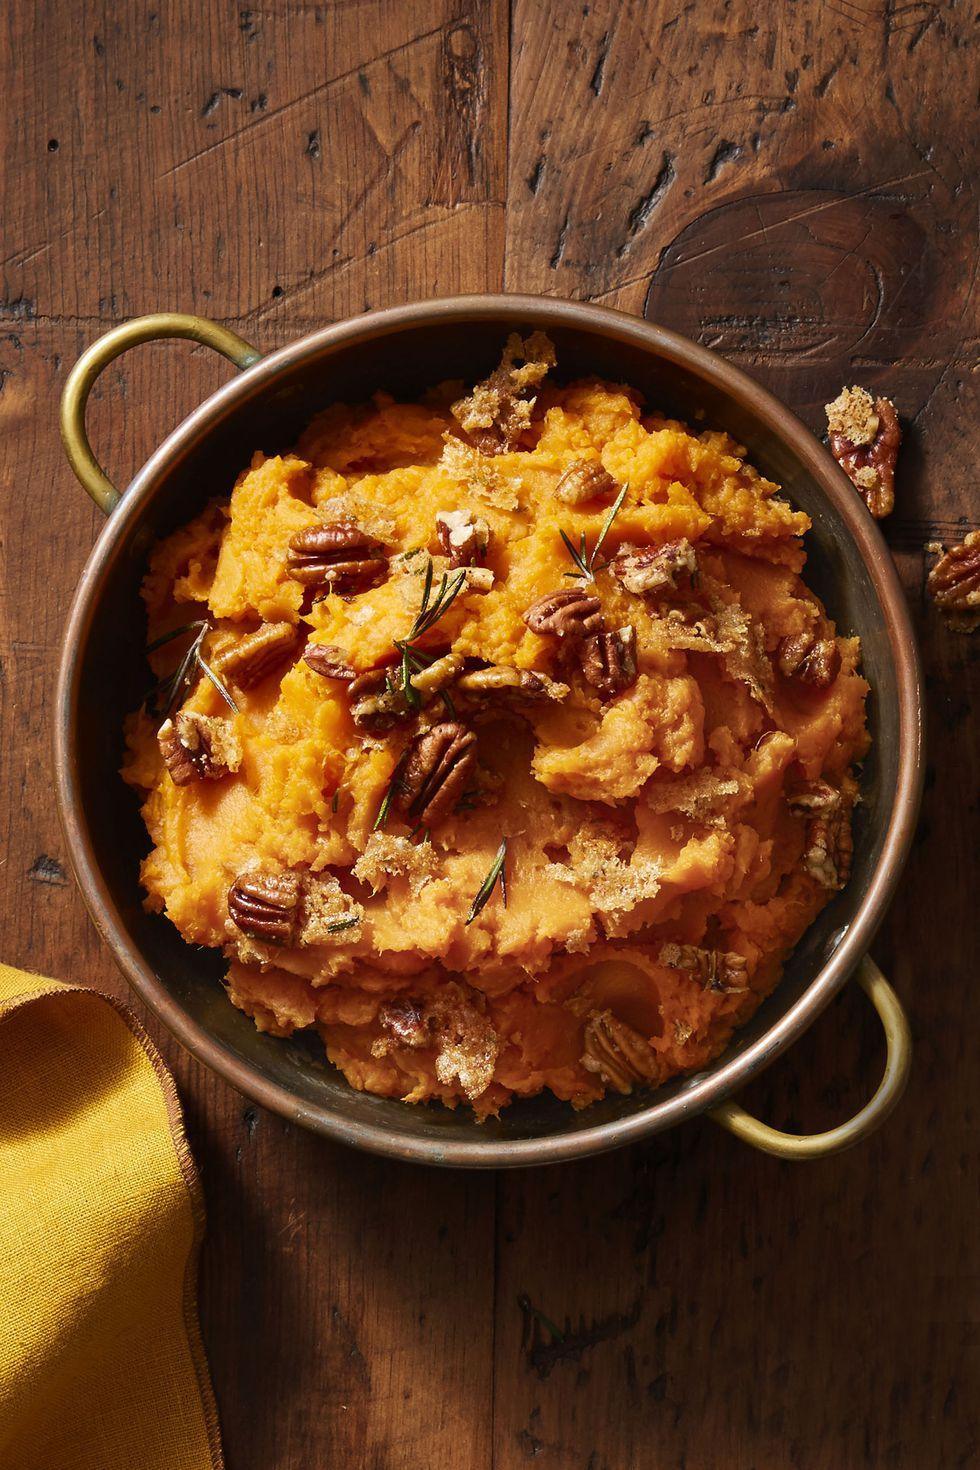 Rosemary-Pecan Mashed Sweet Potatoes dish recipe